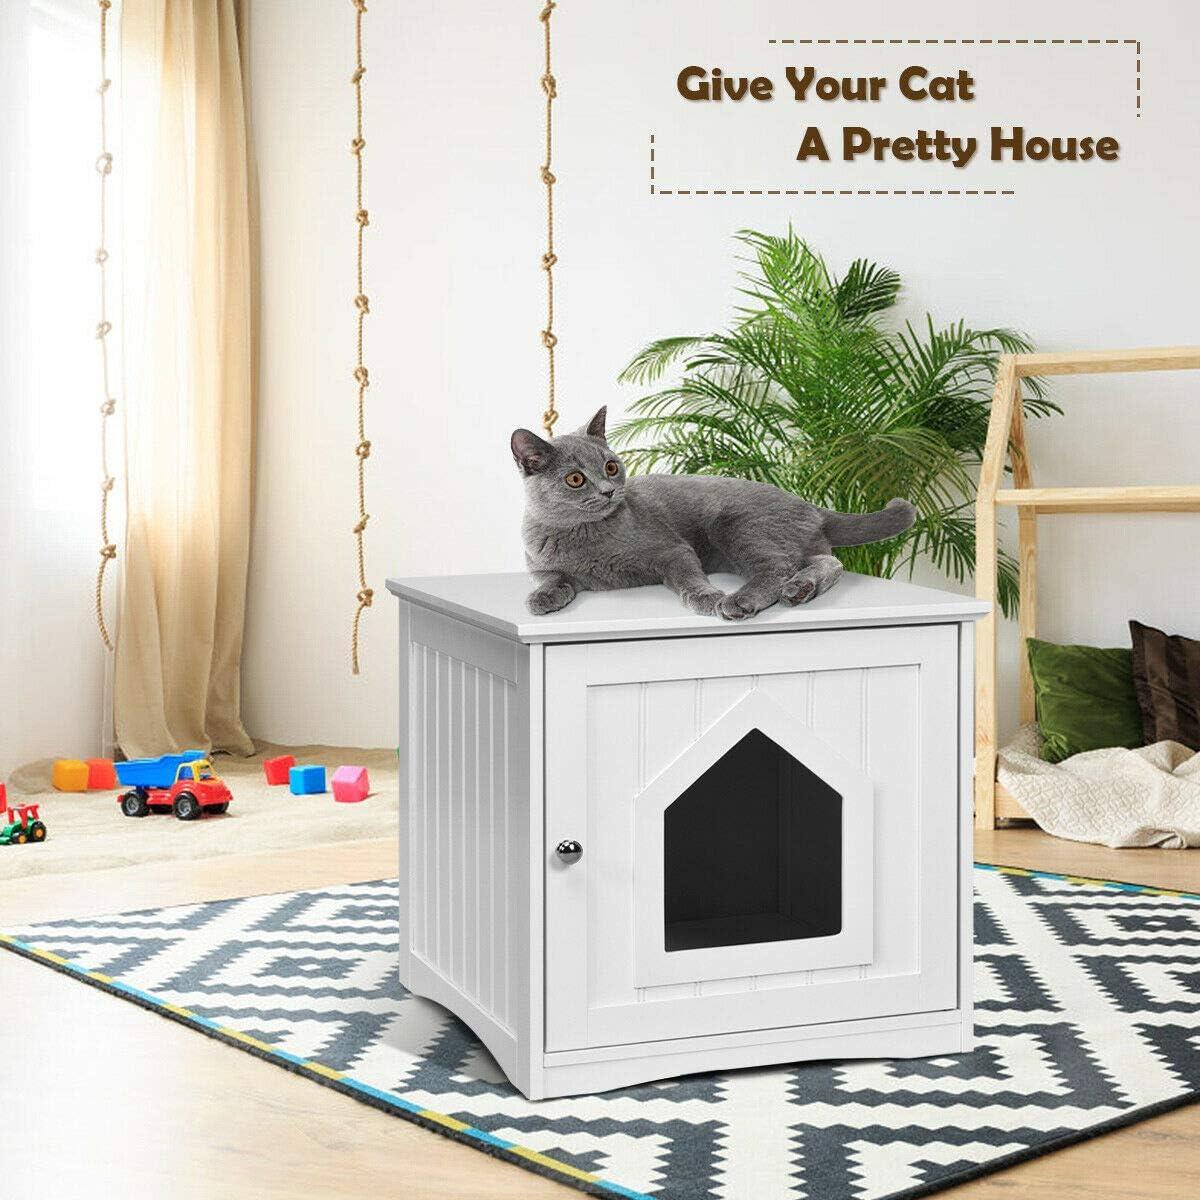 PETSITE Cat House Litter Box Decorative Pet Cat Home Nightstand House Cat Washroom Litter Box